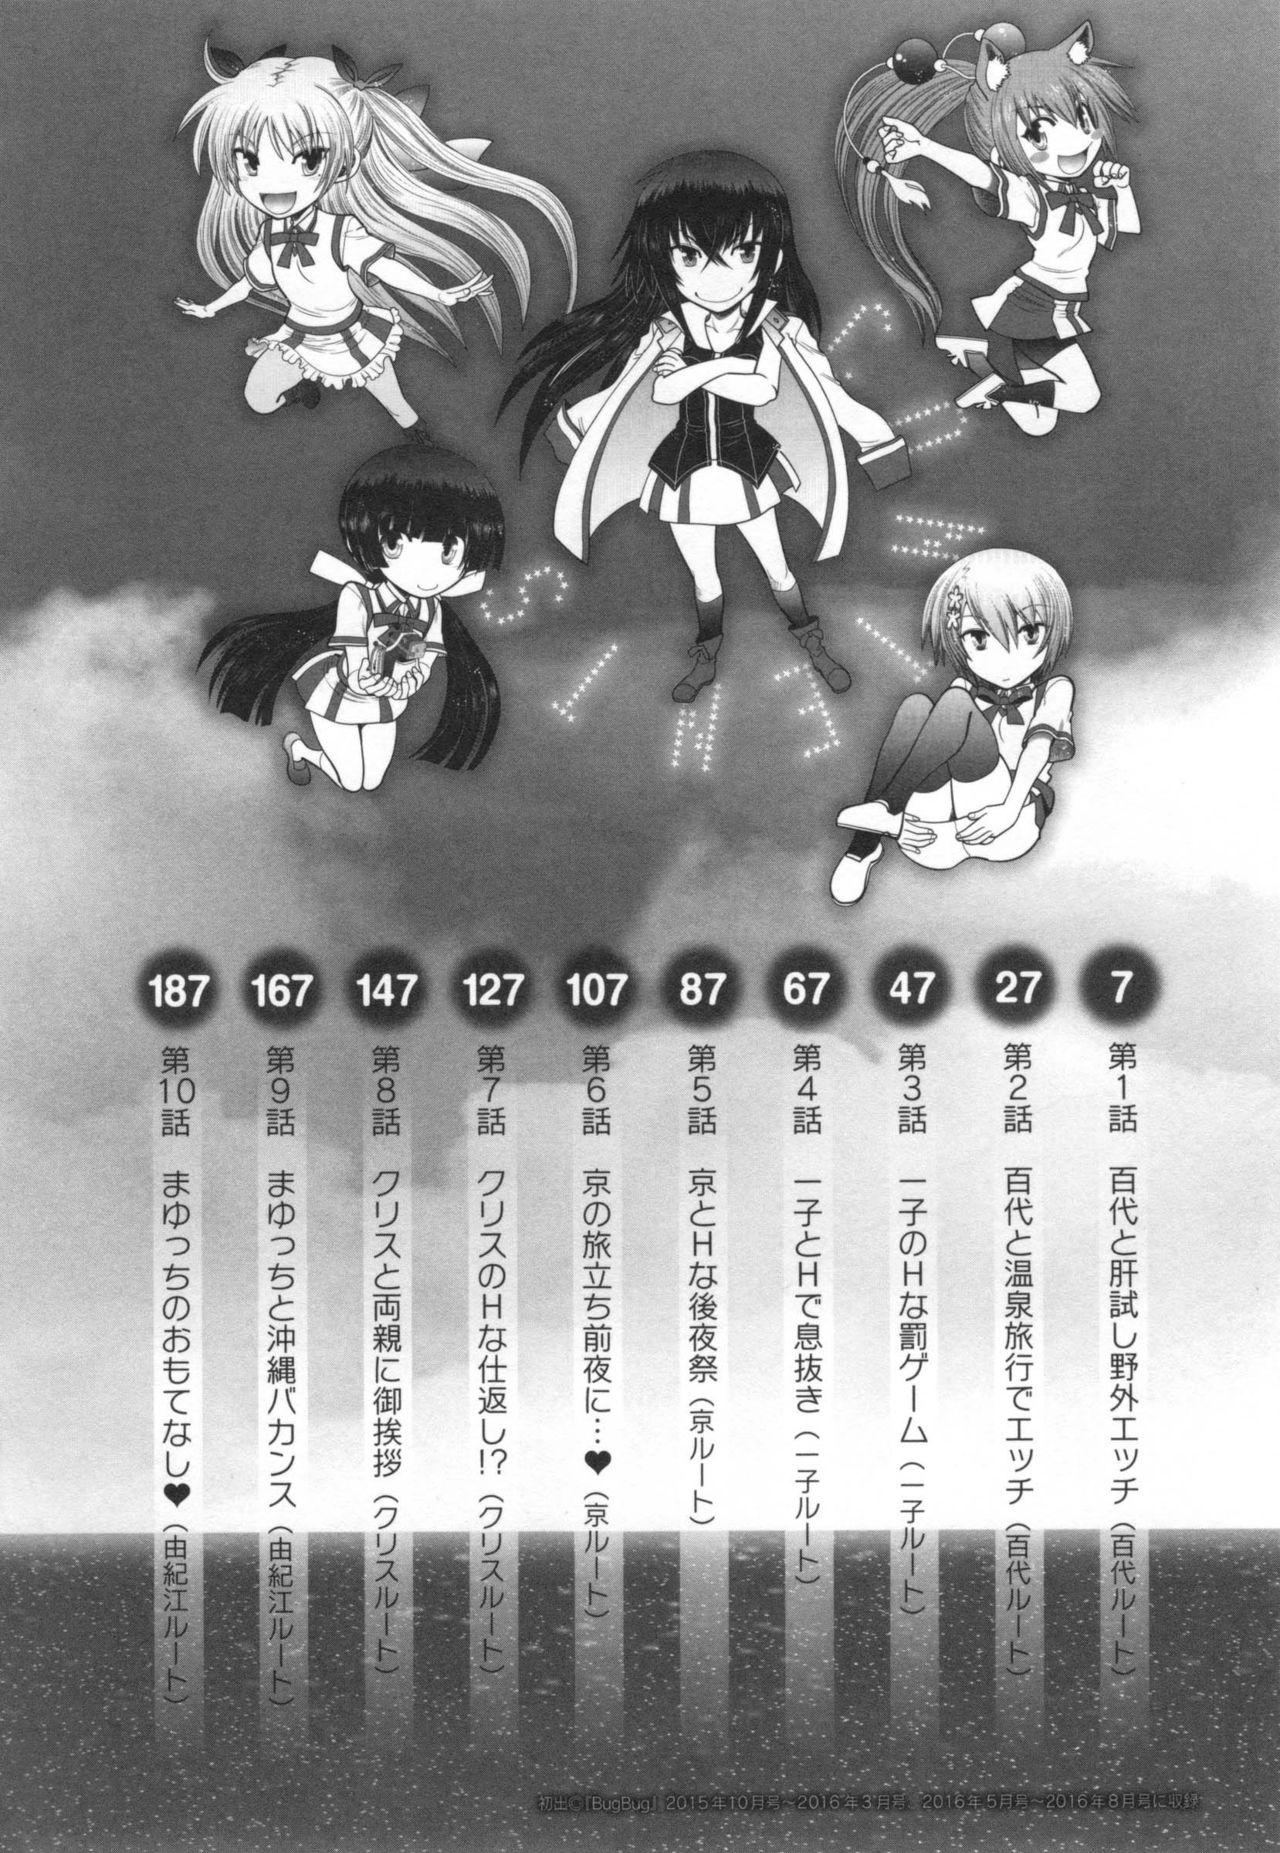 [Yagami Dai] Maji de Watashi ni Koi Shinasai! S Adult Edition ~Shodai Heroine Hen~ | Fall in Love With Me For Real! Ch.1-6 [English] {Doujins.com} 4